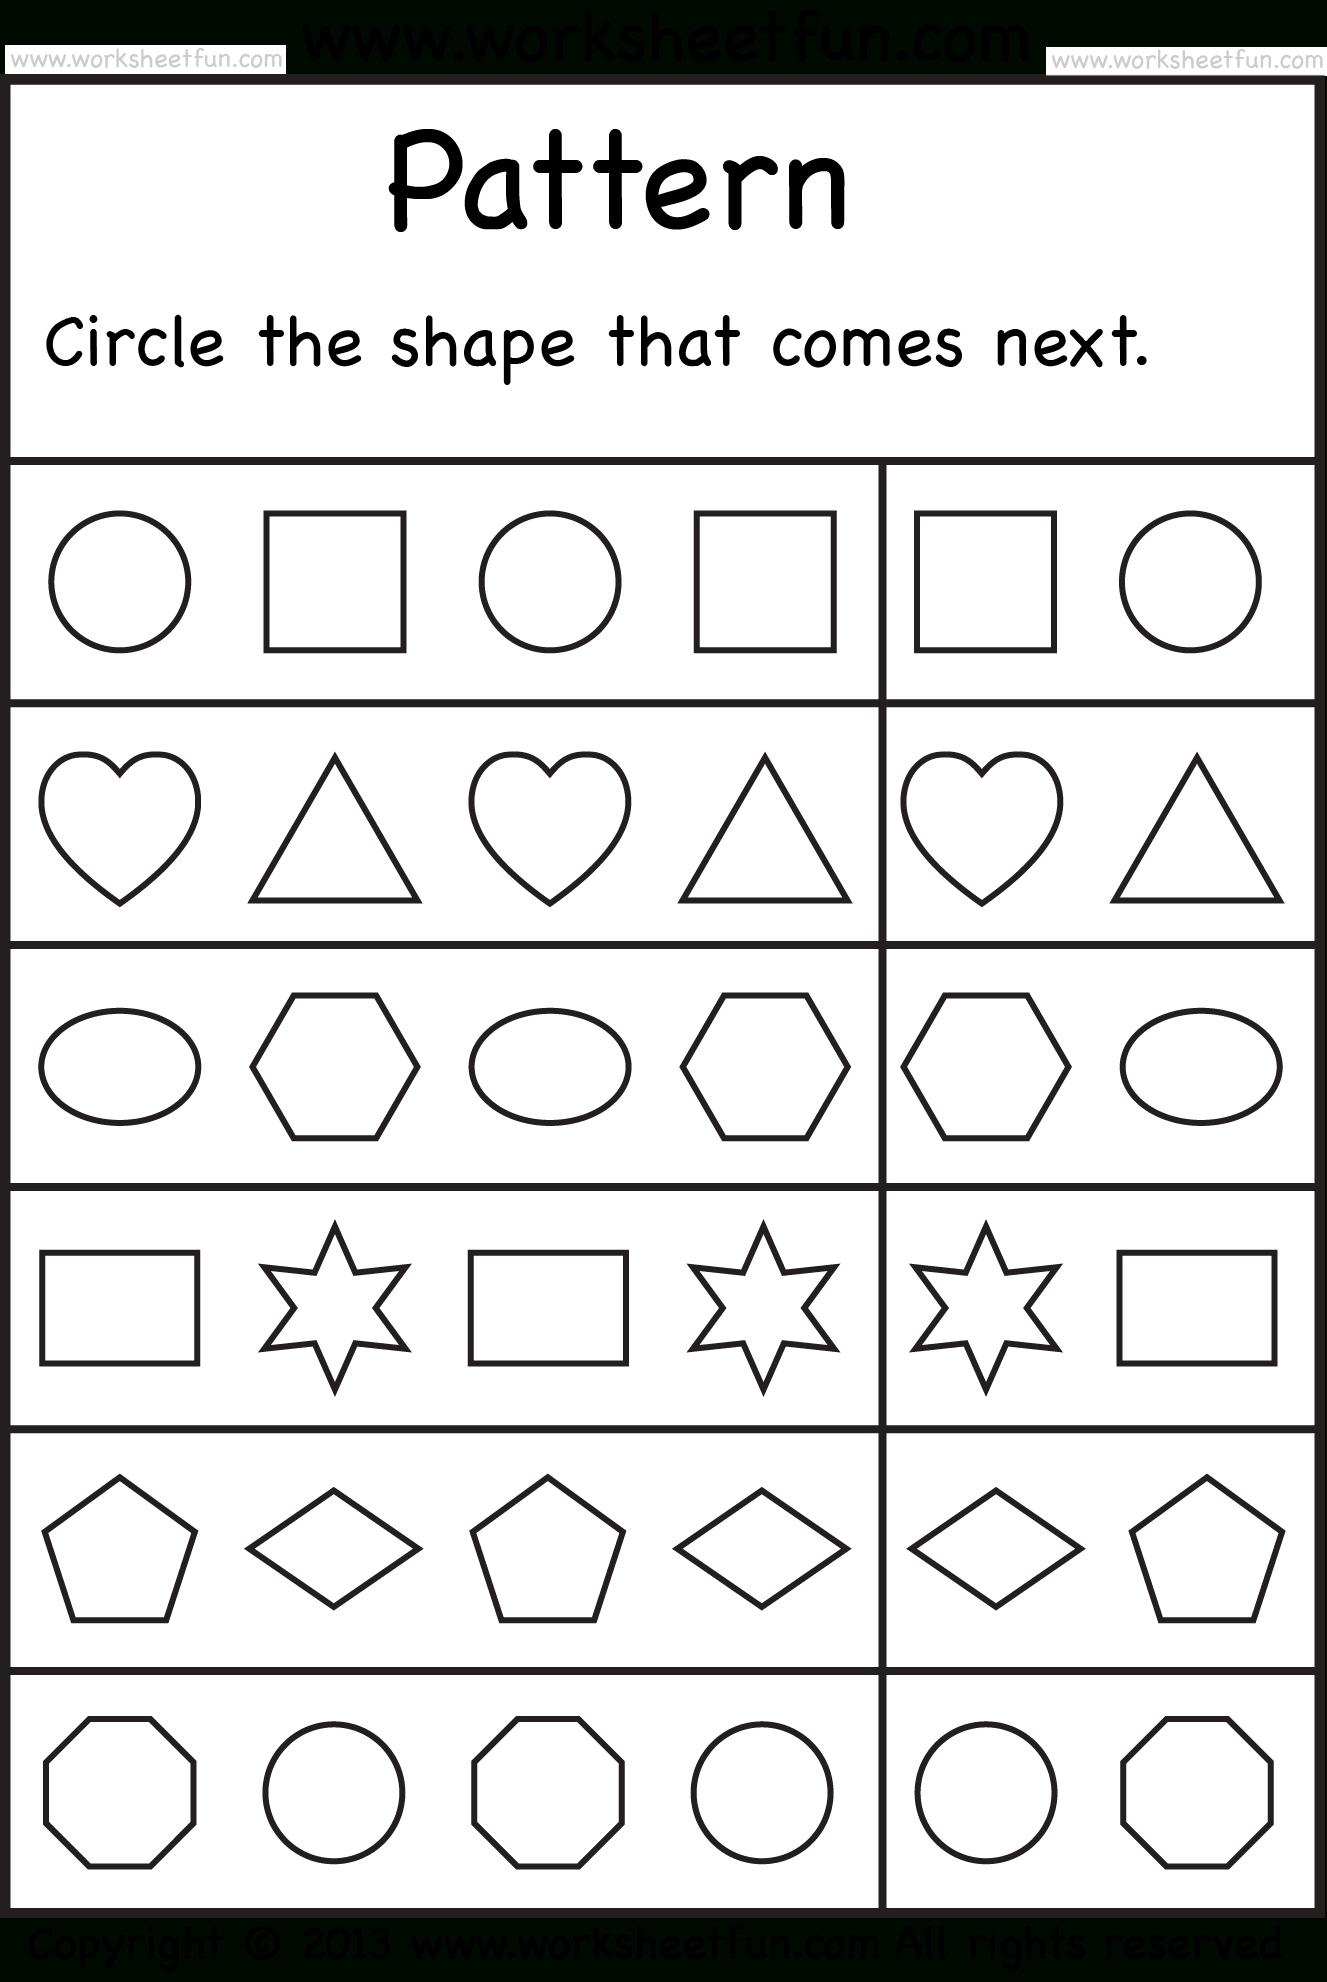 Free Printable Sequencing Worksheets For Kindergarten